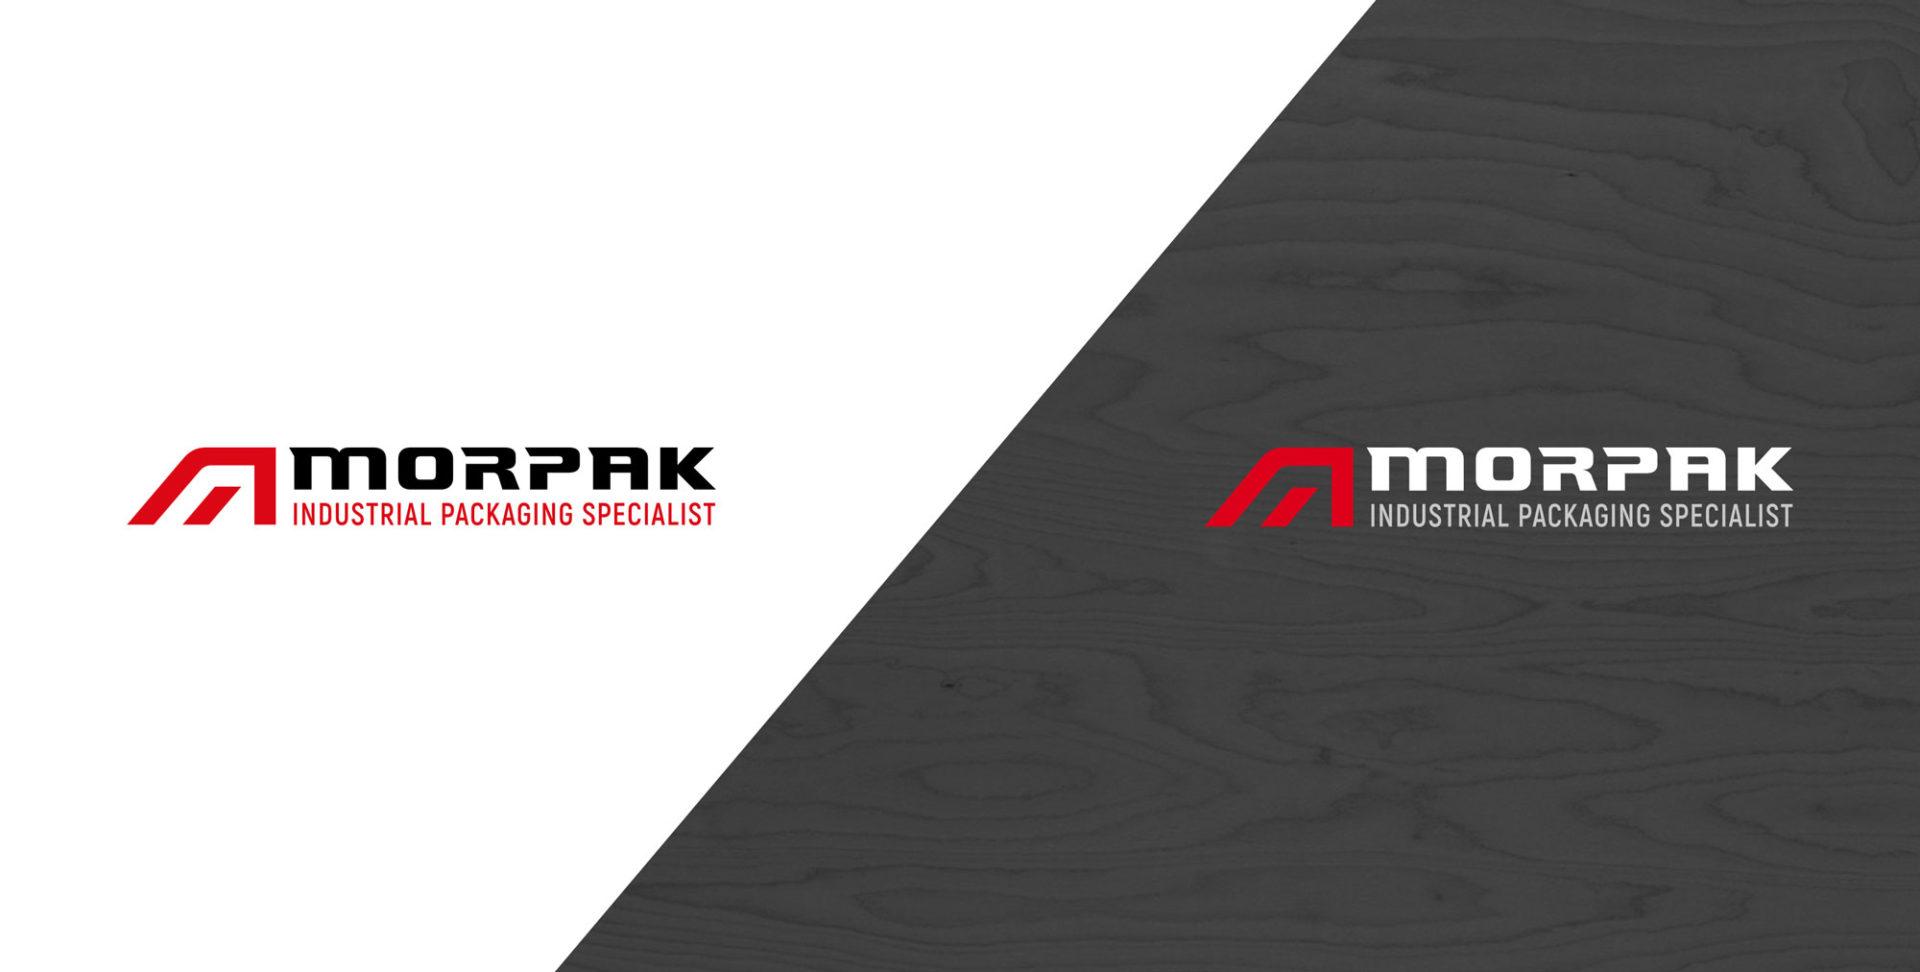 Logo redesign - Rene Verkaart)